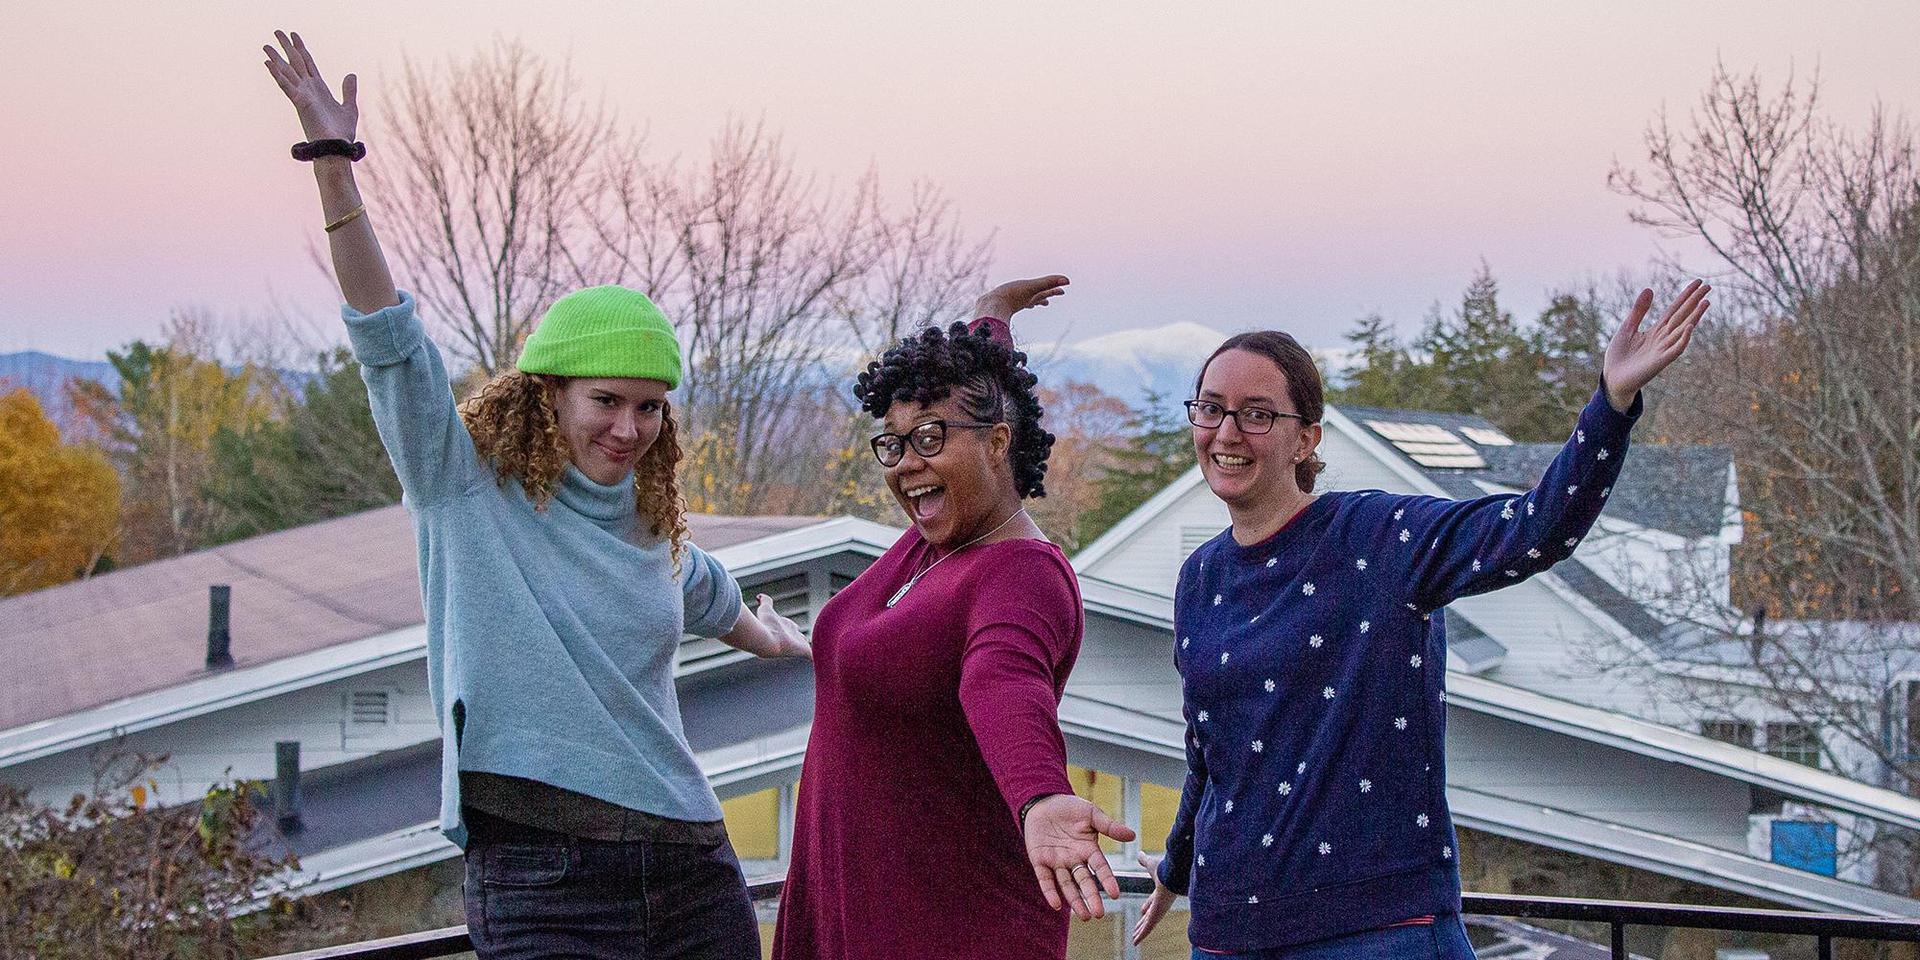 A group of alumnae at Alumnae/i Weekend 2019.